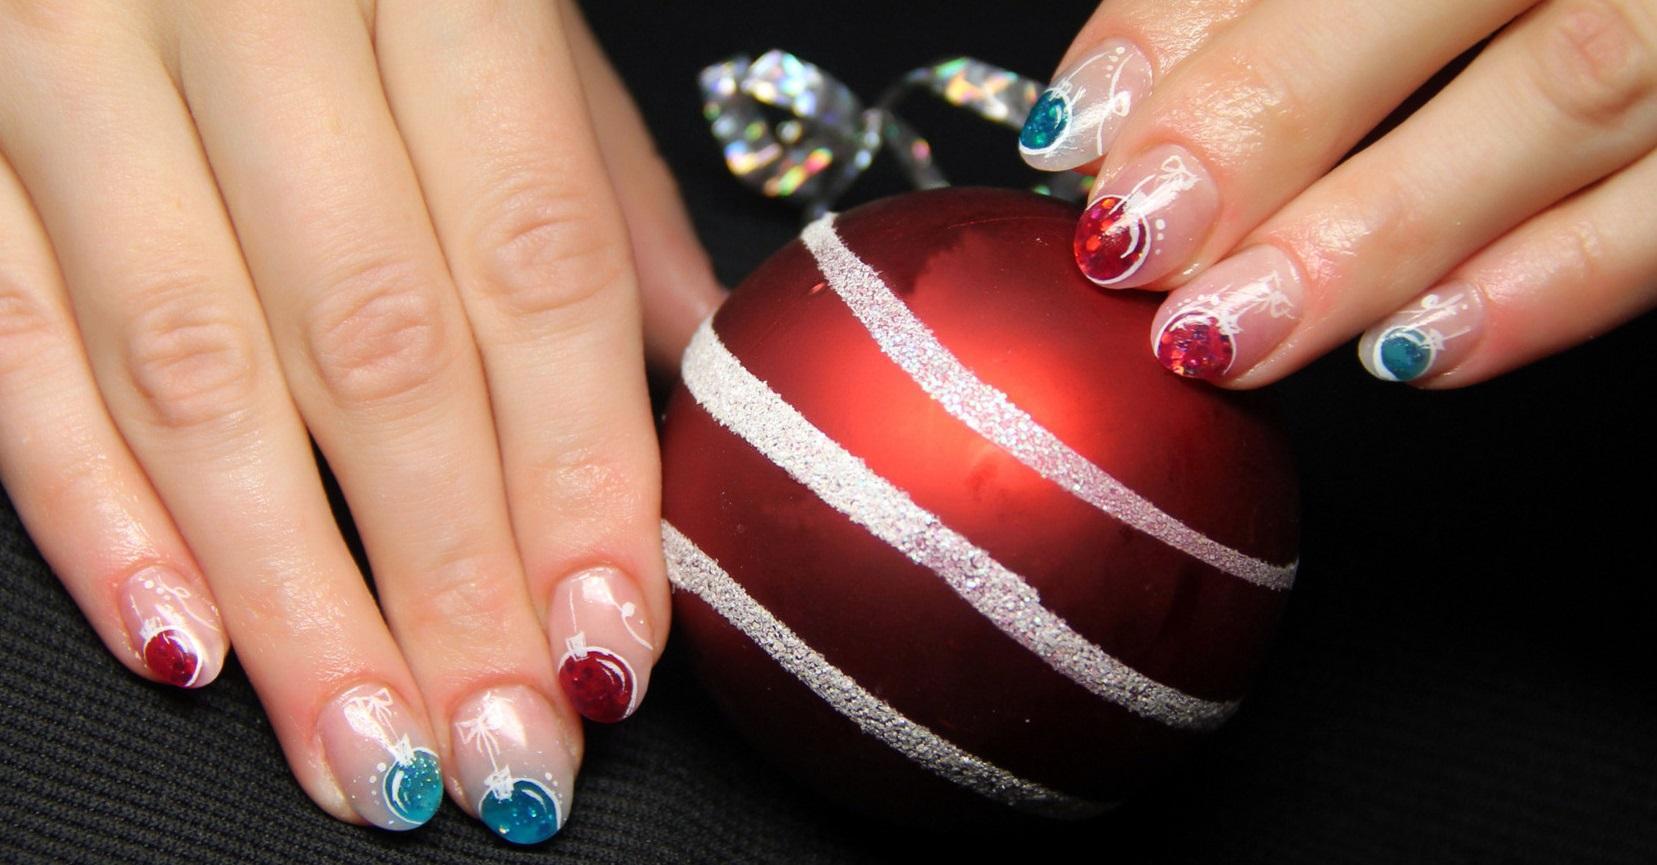 фото ногтей с новогодними шарами